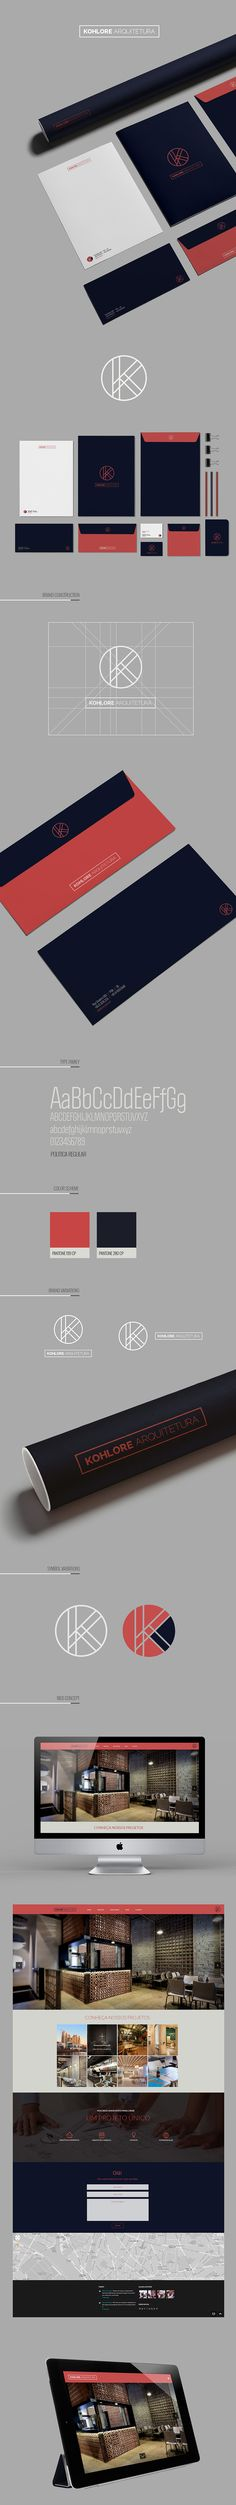 Kohlore Arquitetura branding by Liv Creative Works